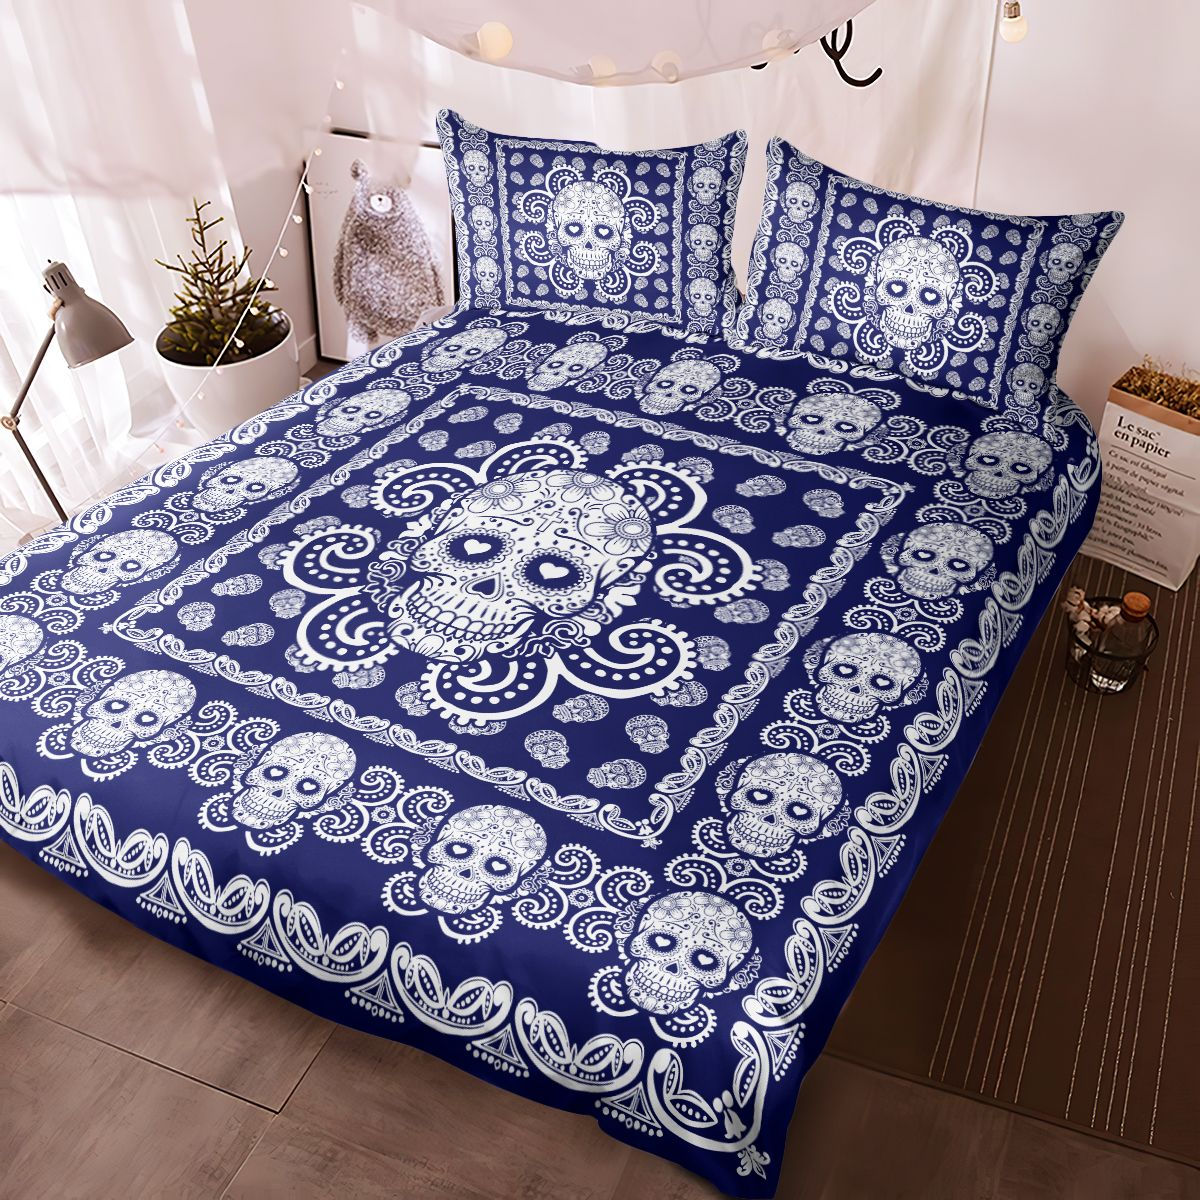 Sugar Skull Navy and White Pattern Premium Bedding Set